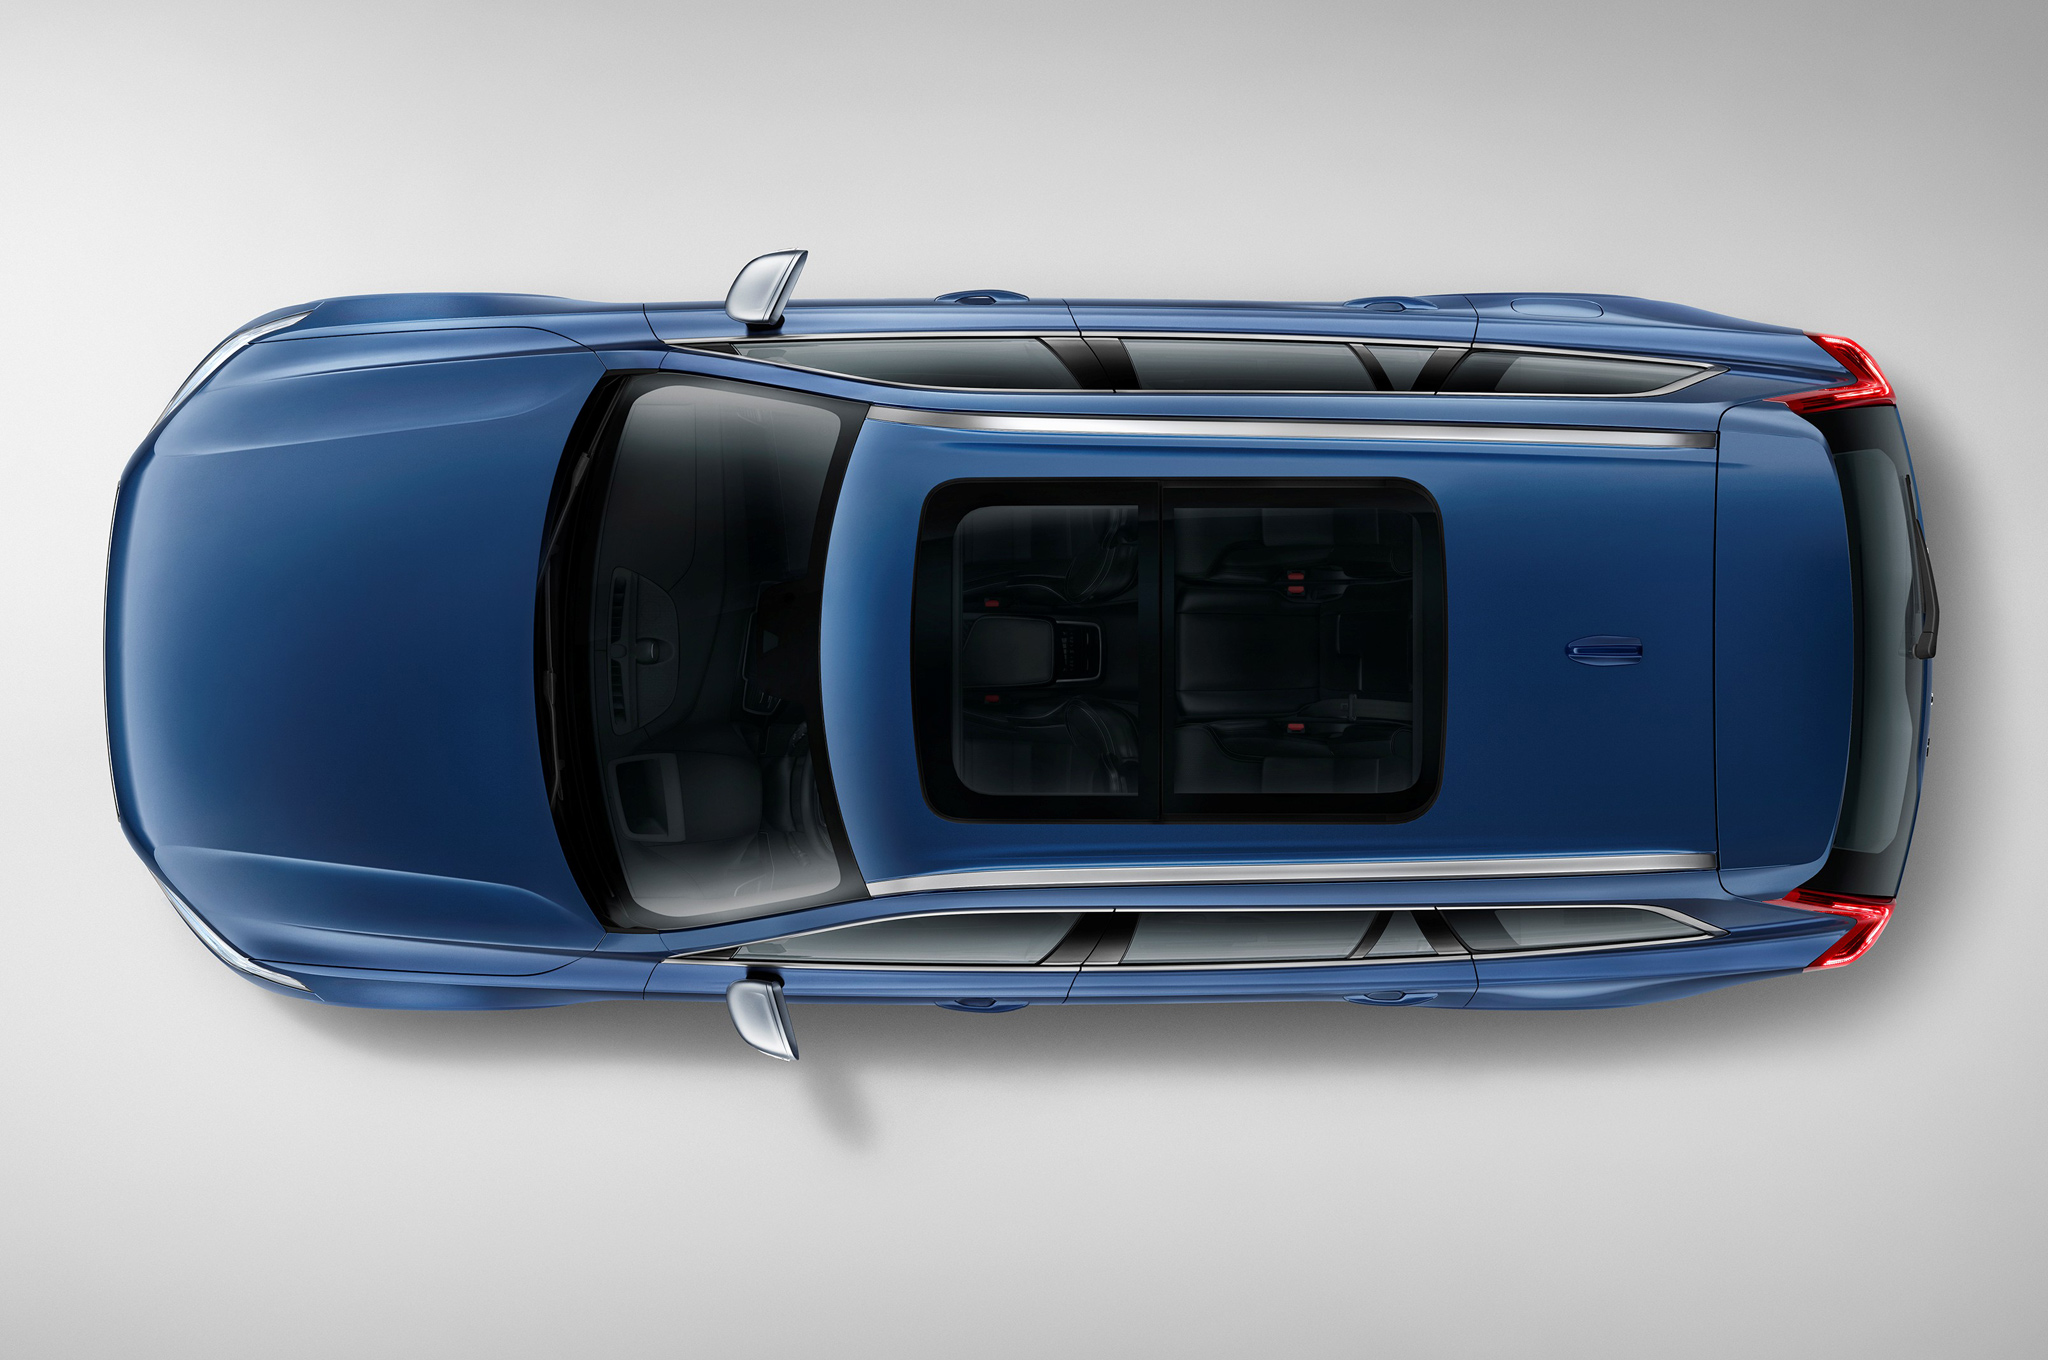 2016 Volvo Xc90 R-Design Top View